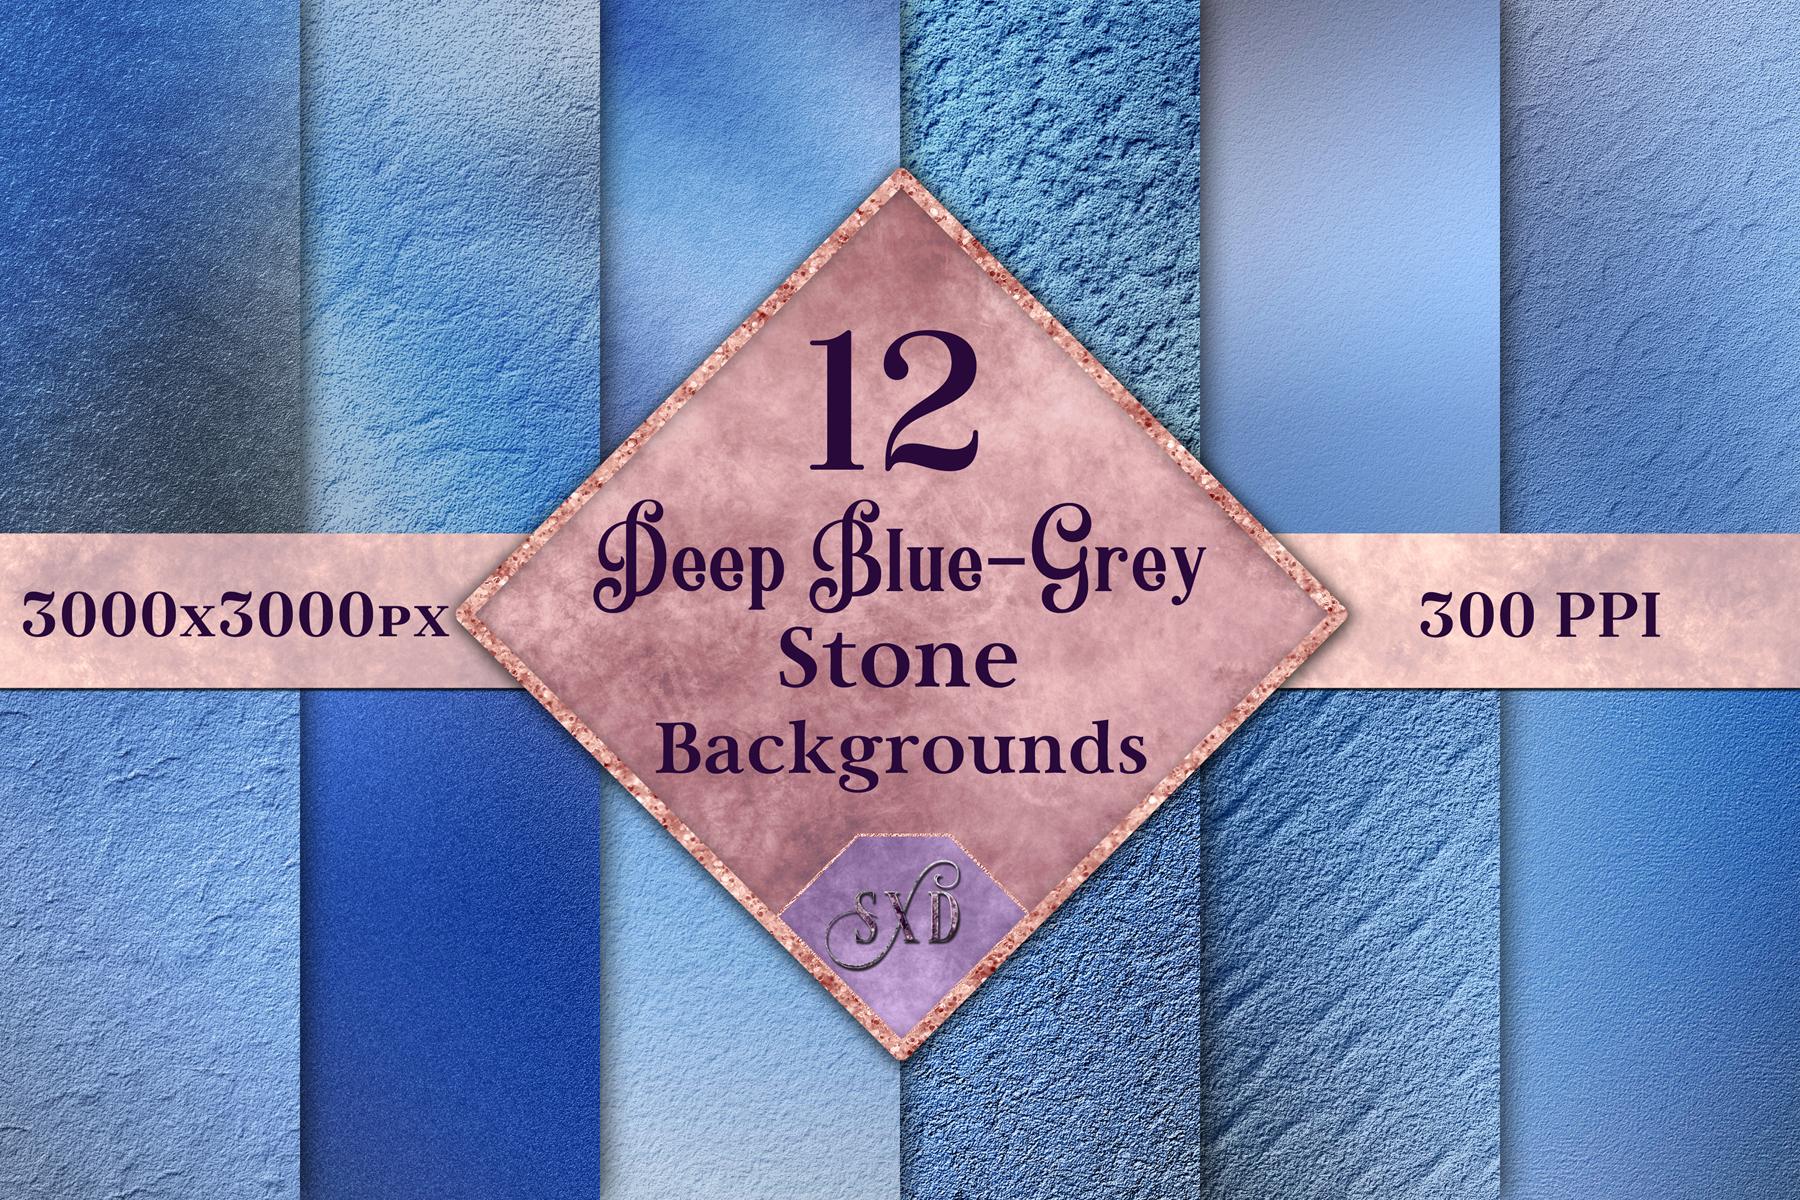 Deep Blue-Grey Stone Backgrounds - 12 Image Textures Set example image 1